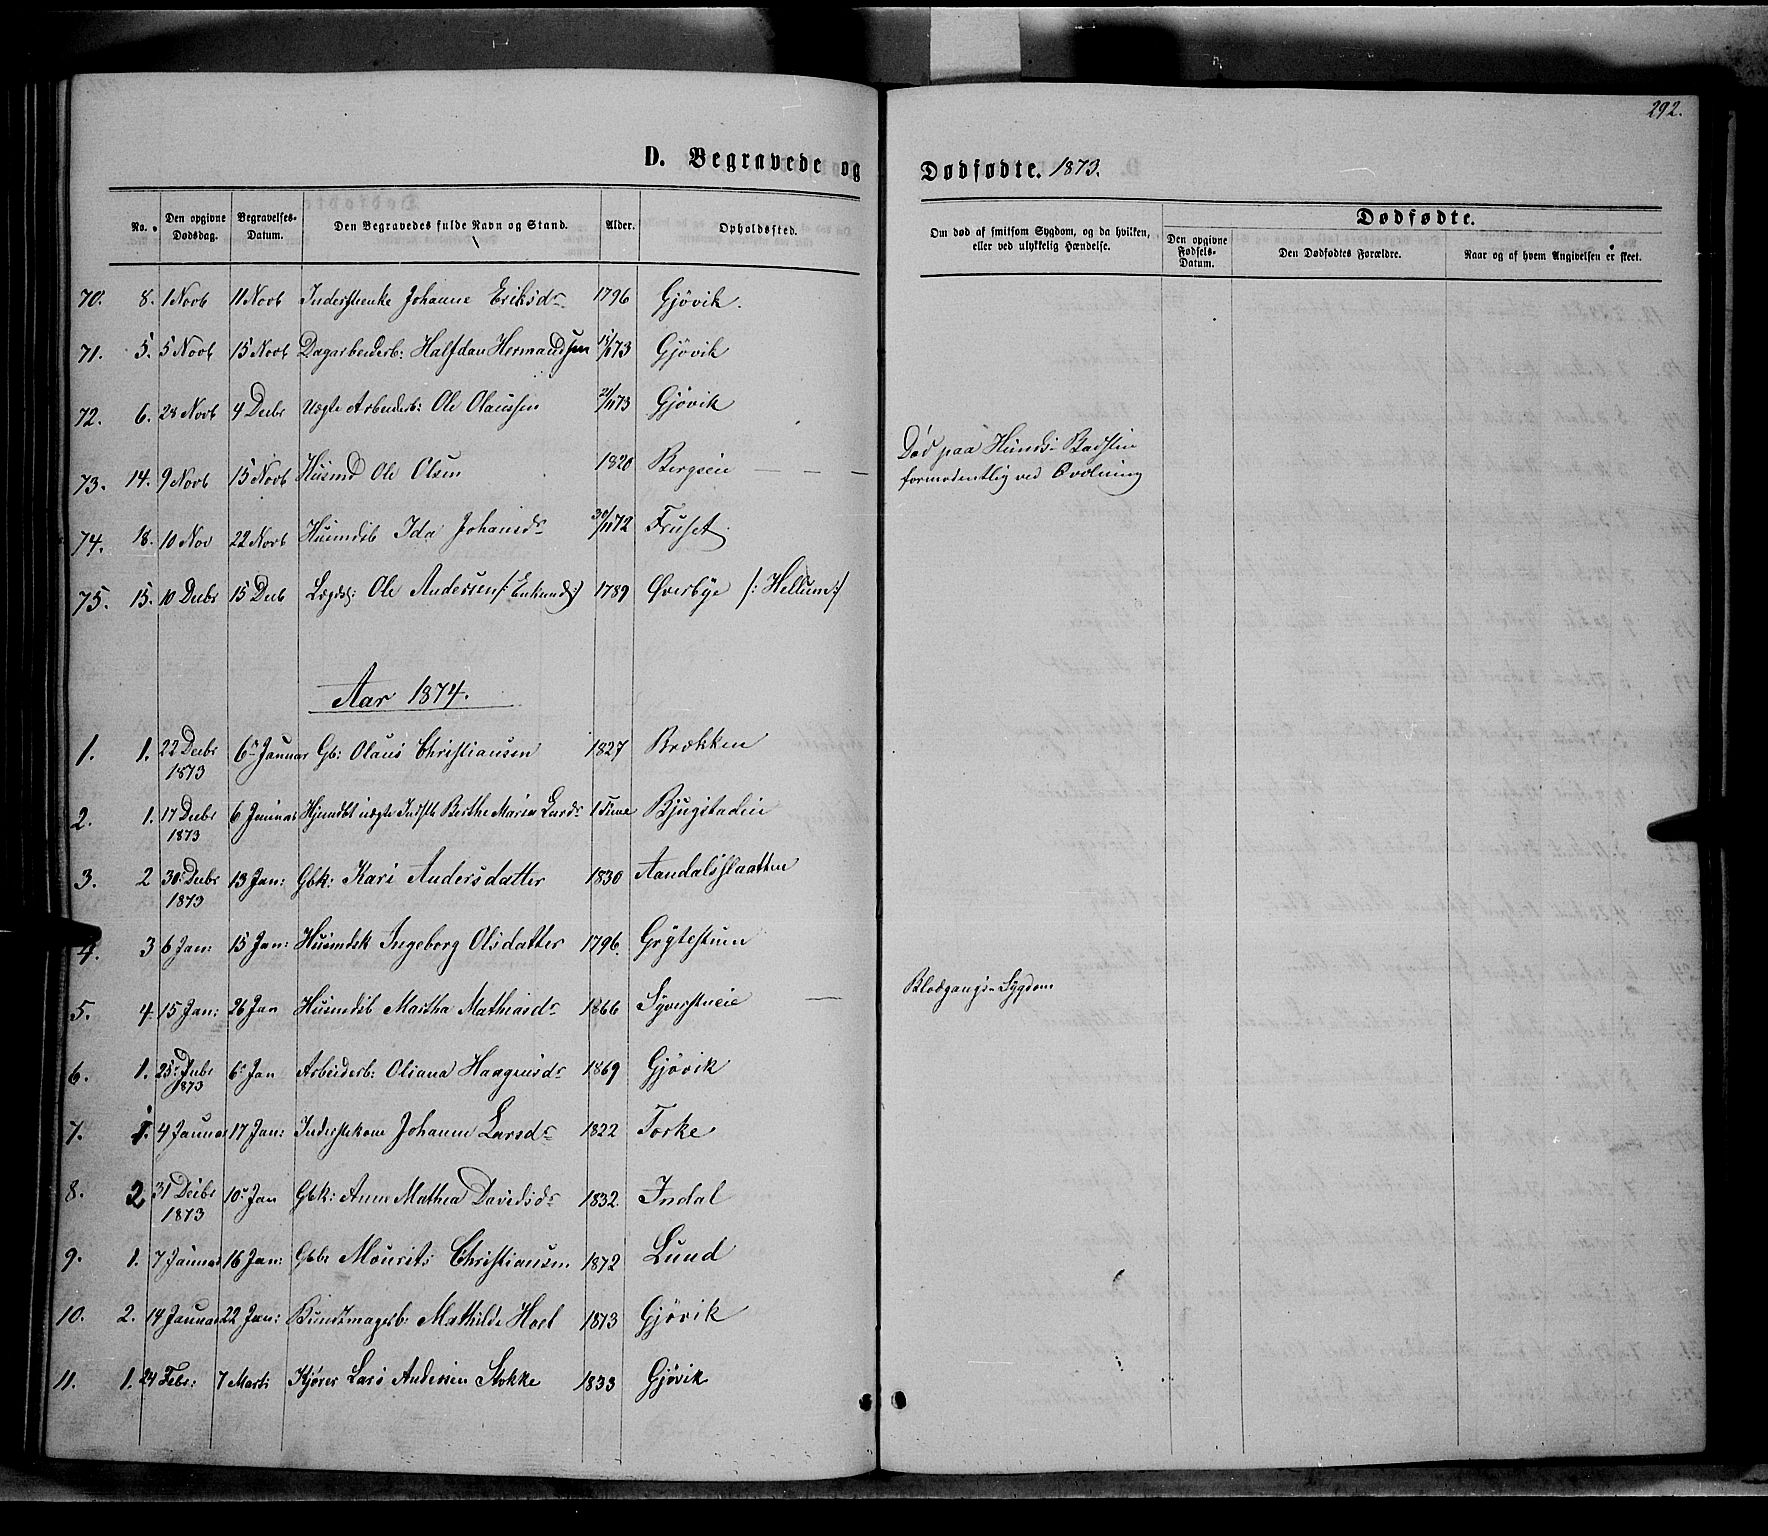 SAH, Vardal prestekontor, H/Ha/Hab/L0006: Klokkerbok nr. 6, 1869-1881, s. 292